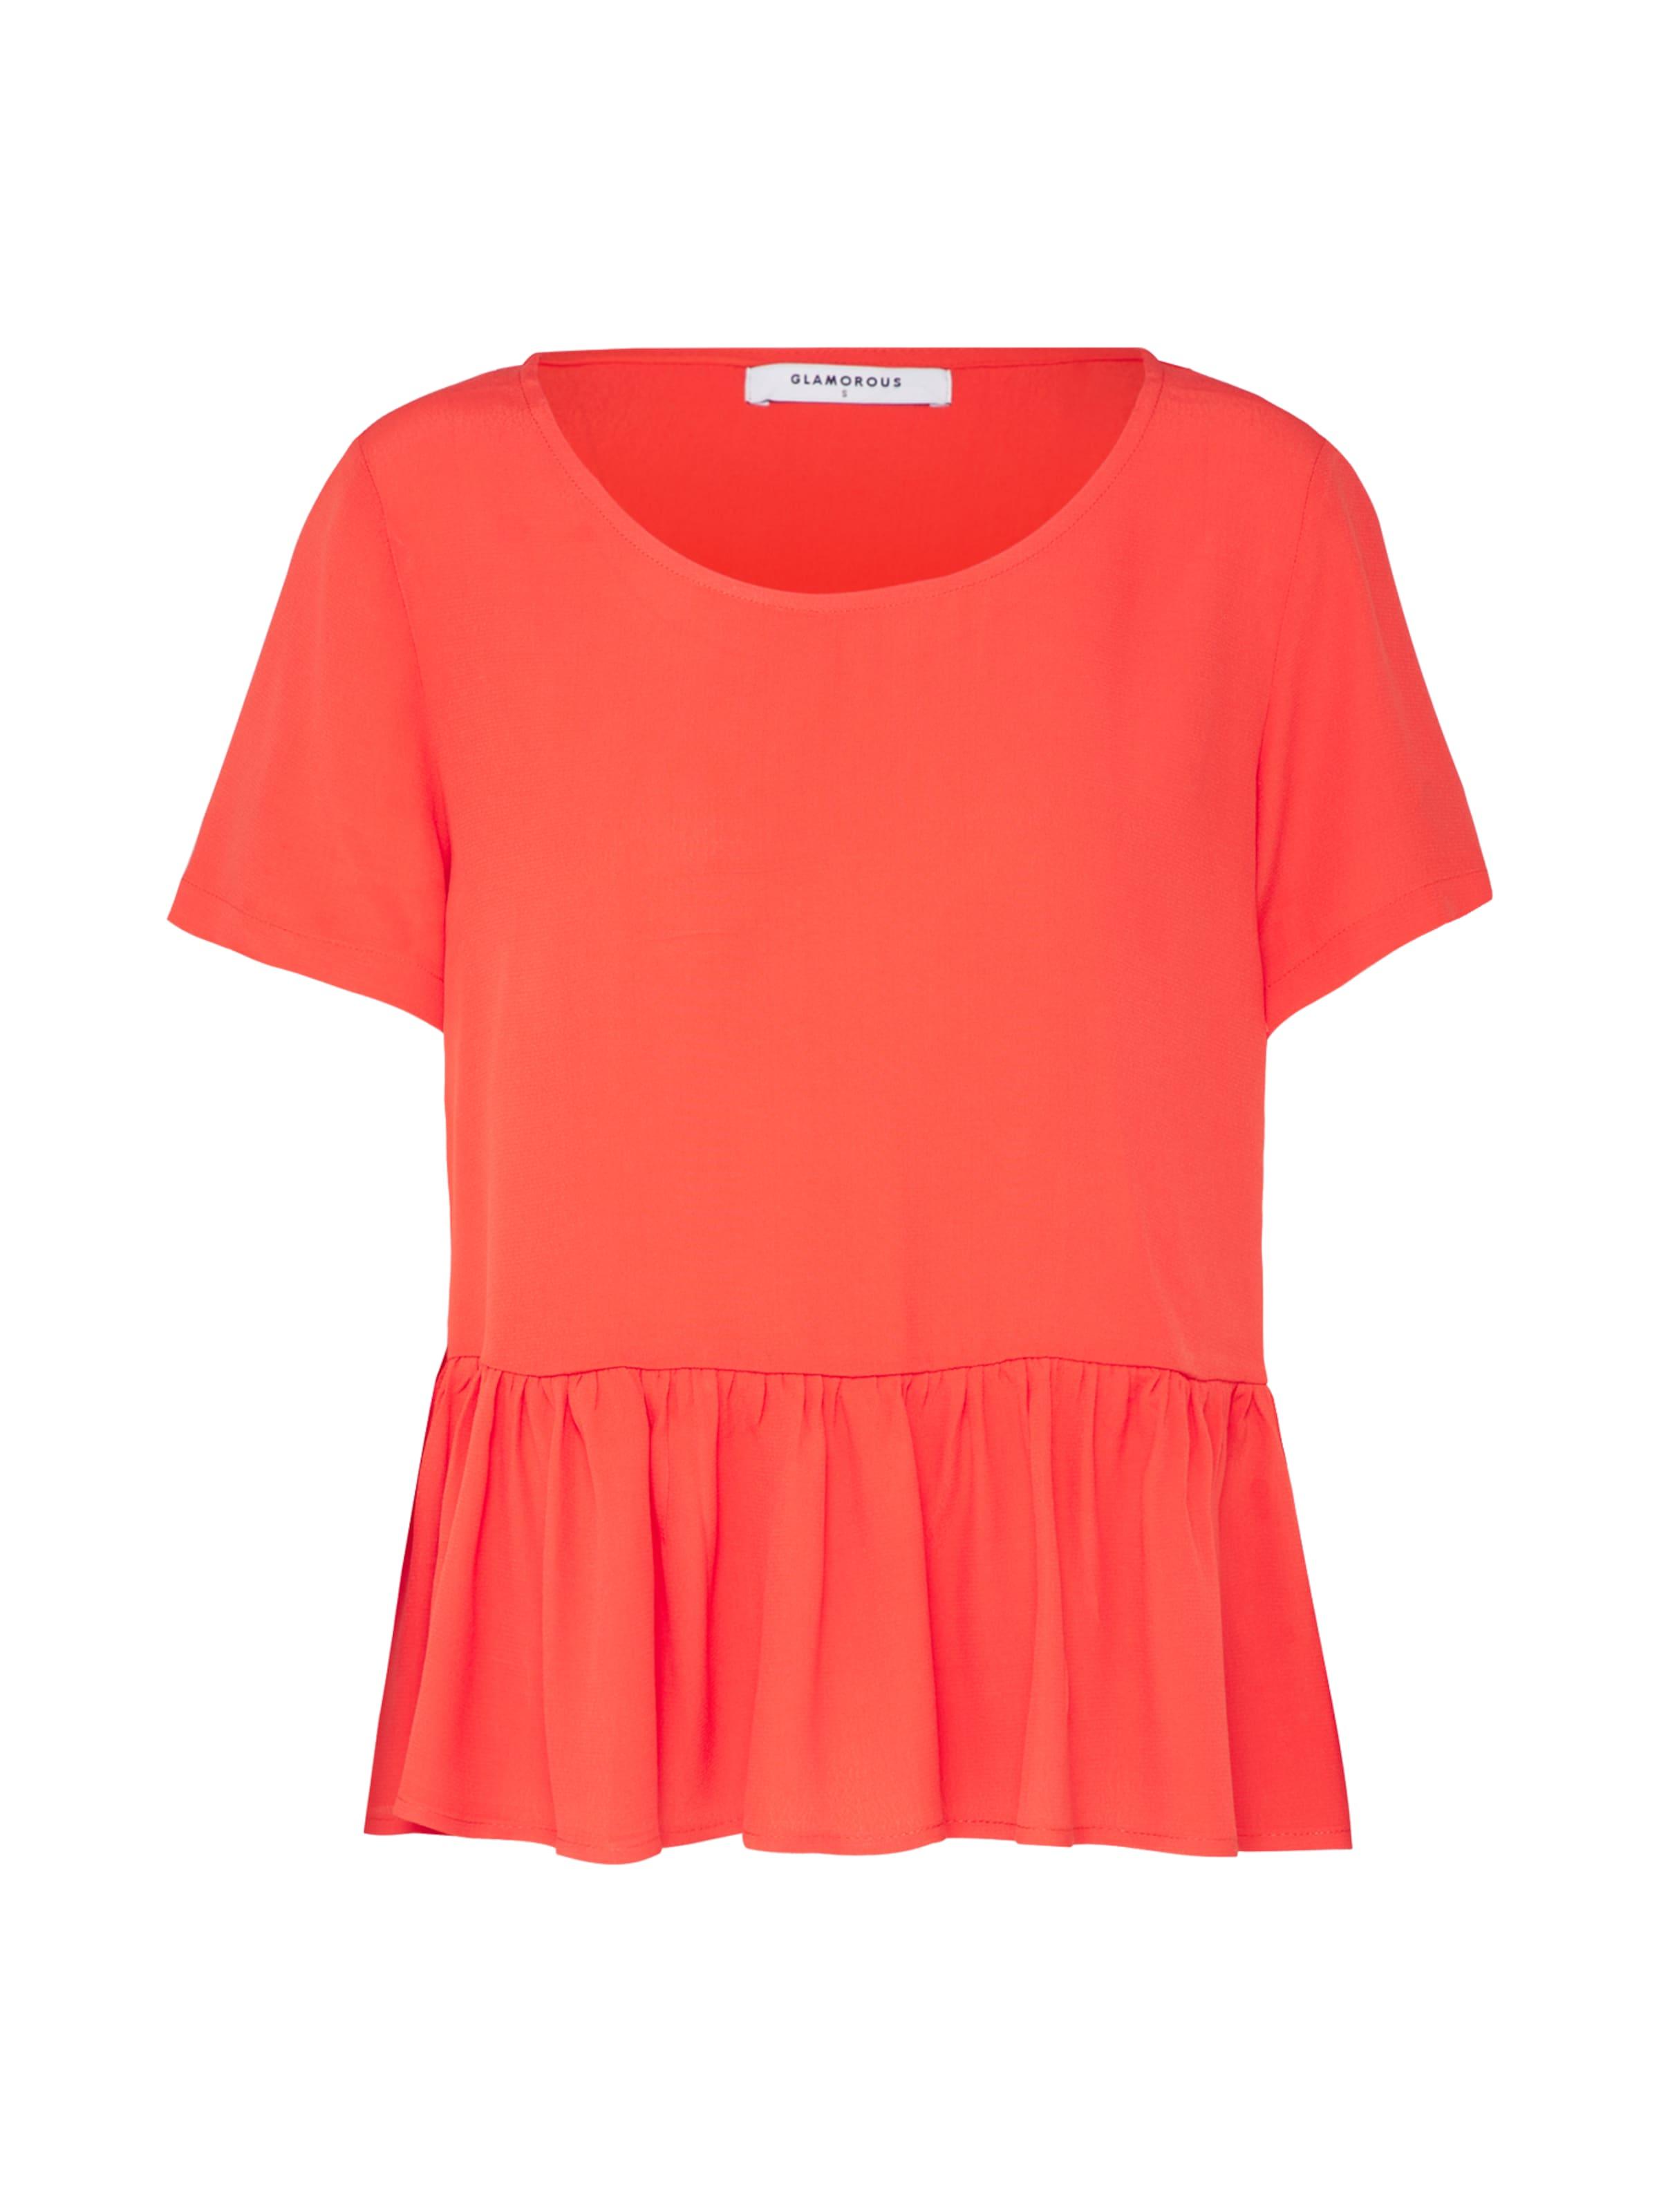 En Glamorous shirt 'ck4269' T Rouge Orangé wURUaBtq